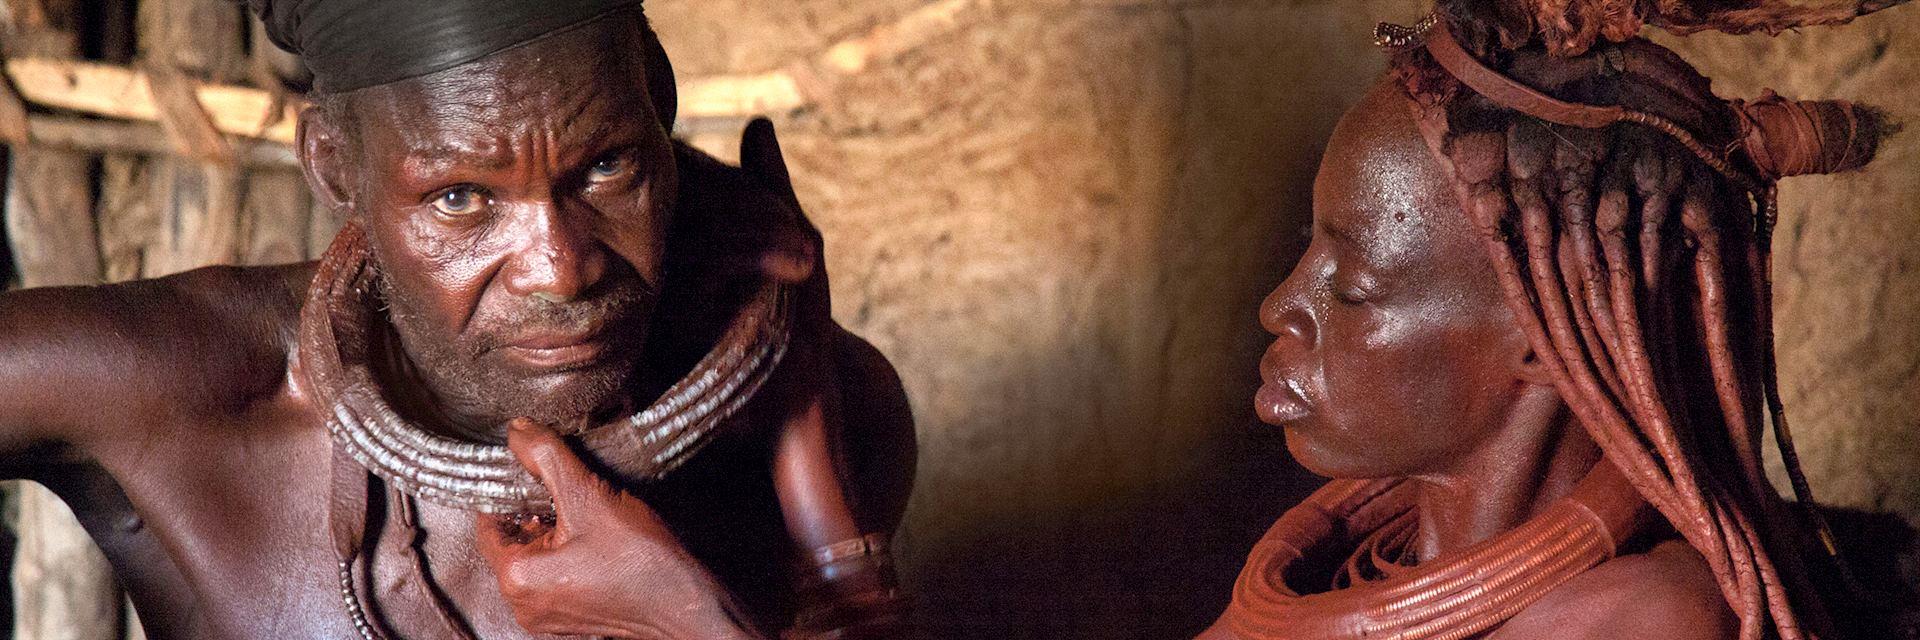 Himba couple, Kaokoland